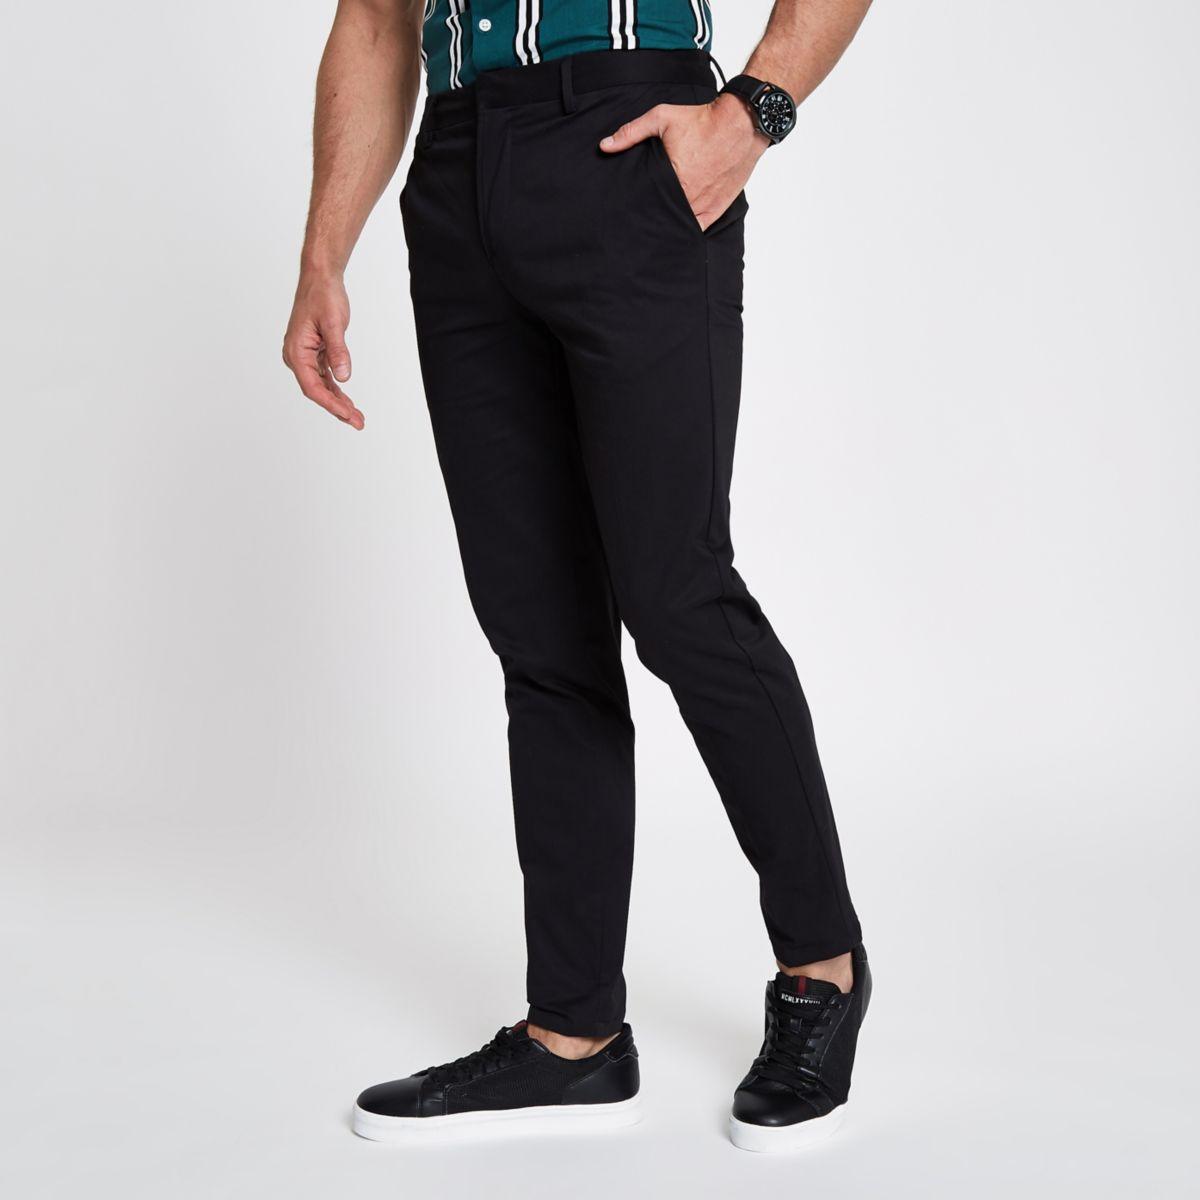 Pantalon chino skinny noir court